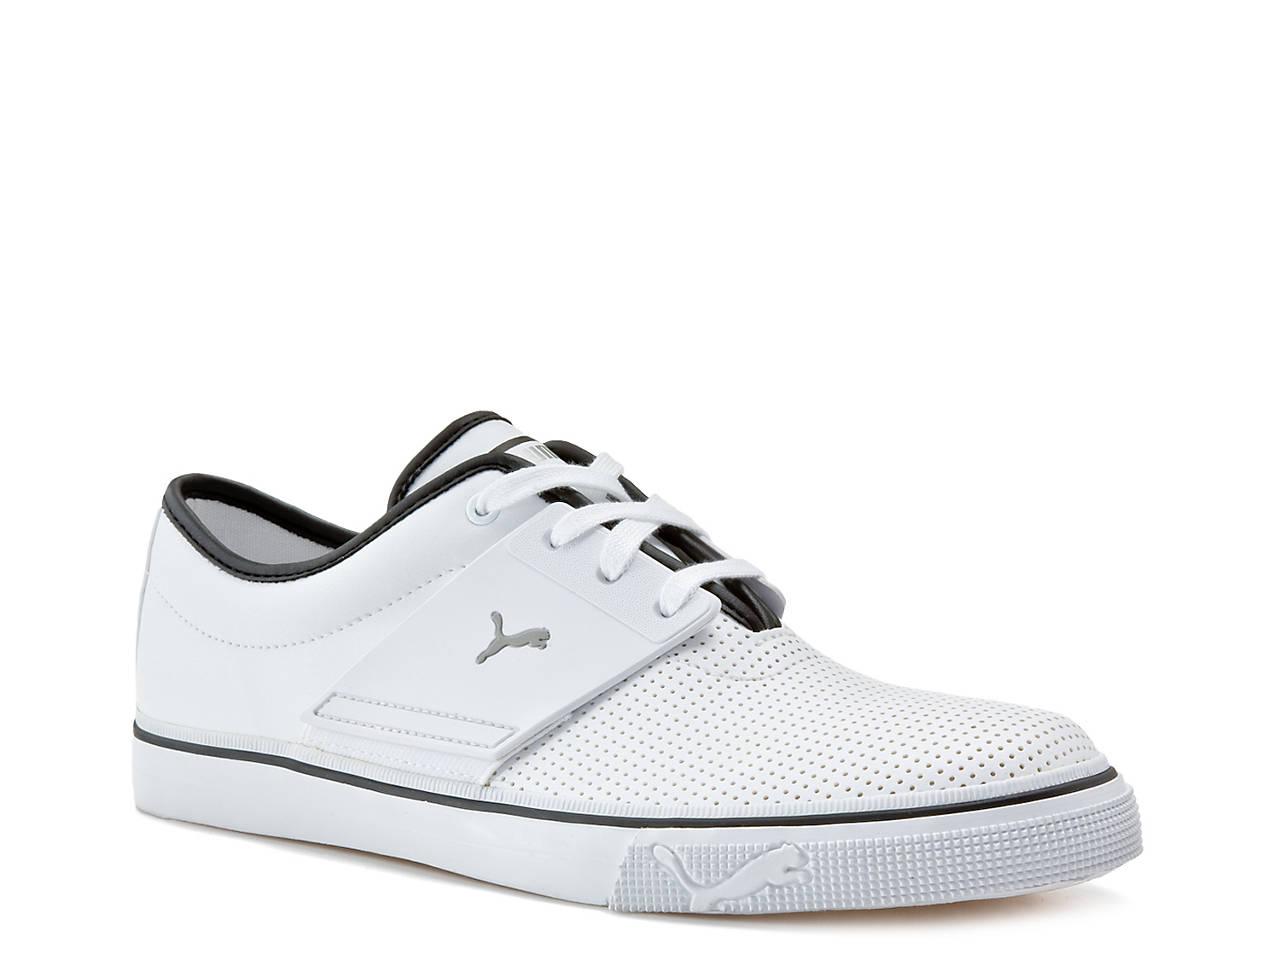 Puma El Ace Sneaker - Men s Men s Shoes  1d8d7bc7b